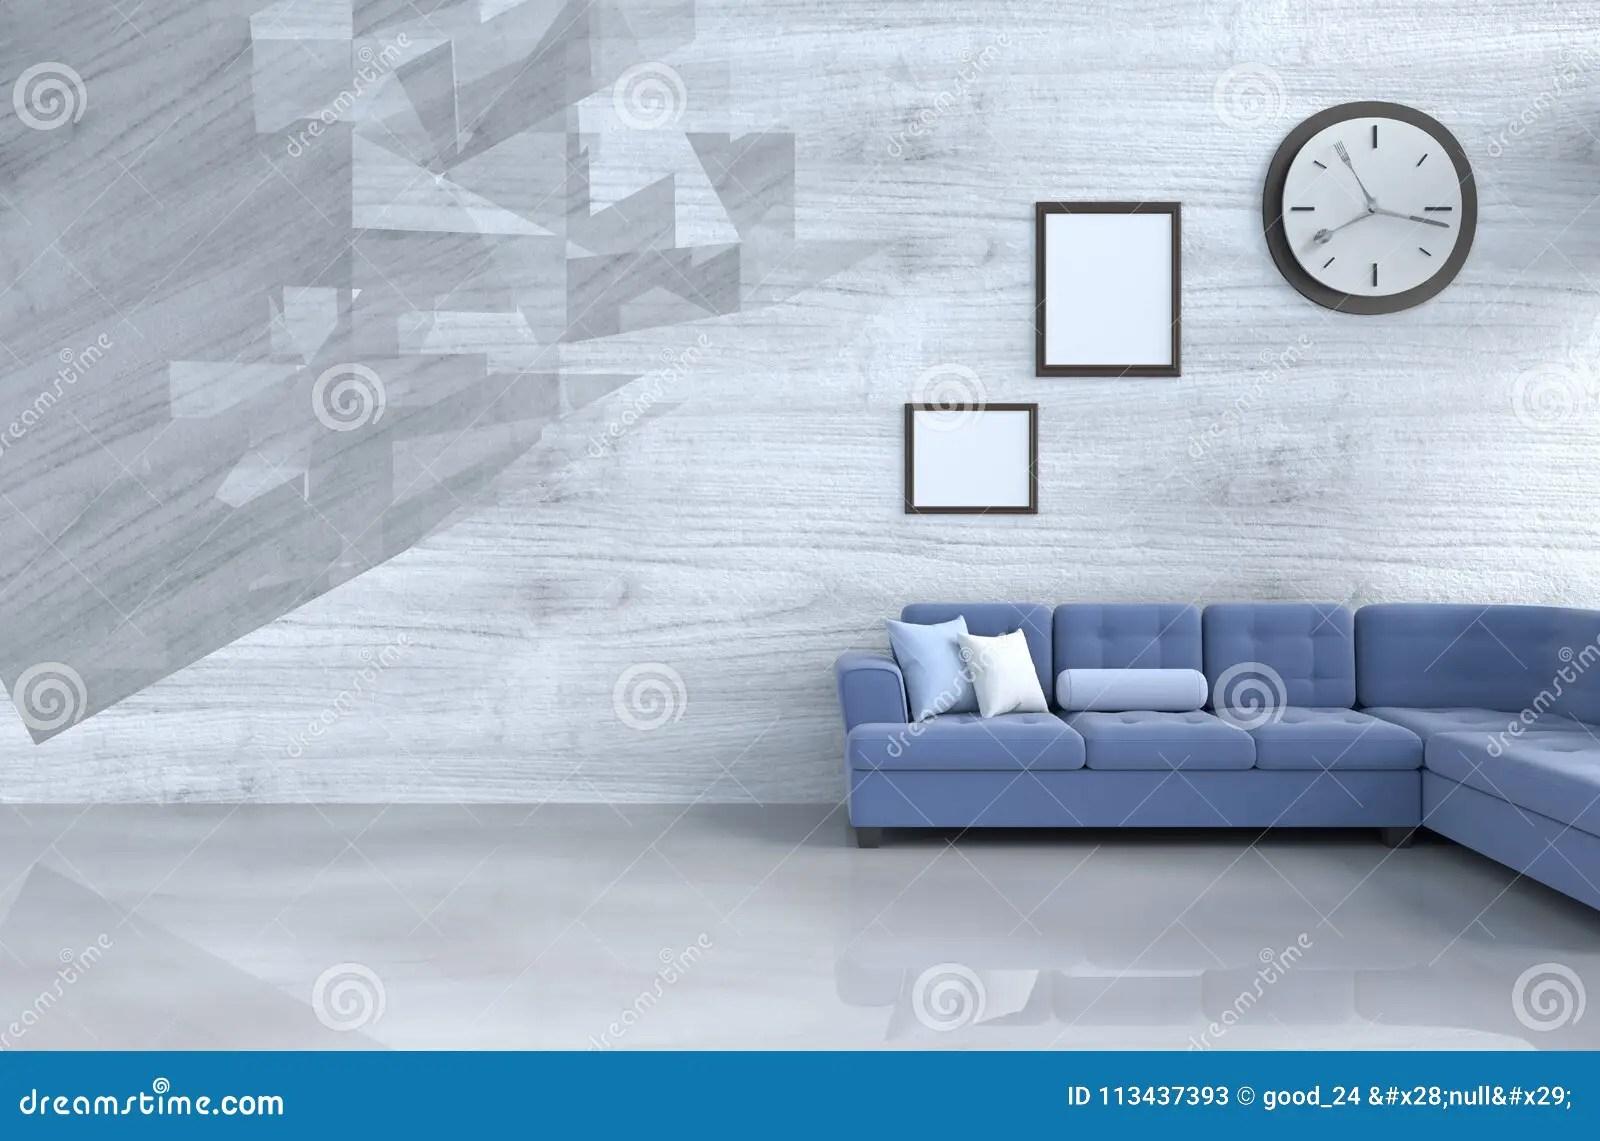 abbie sofa navy natuzzi sleeper grey walls blue living room baci